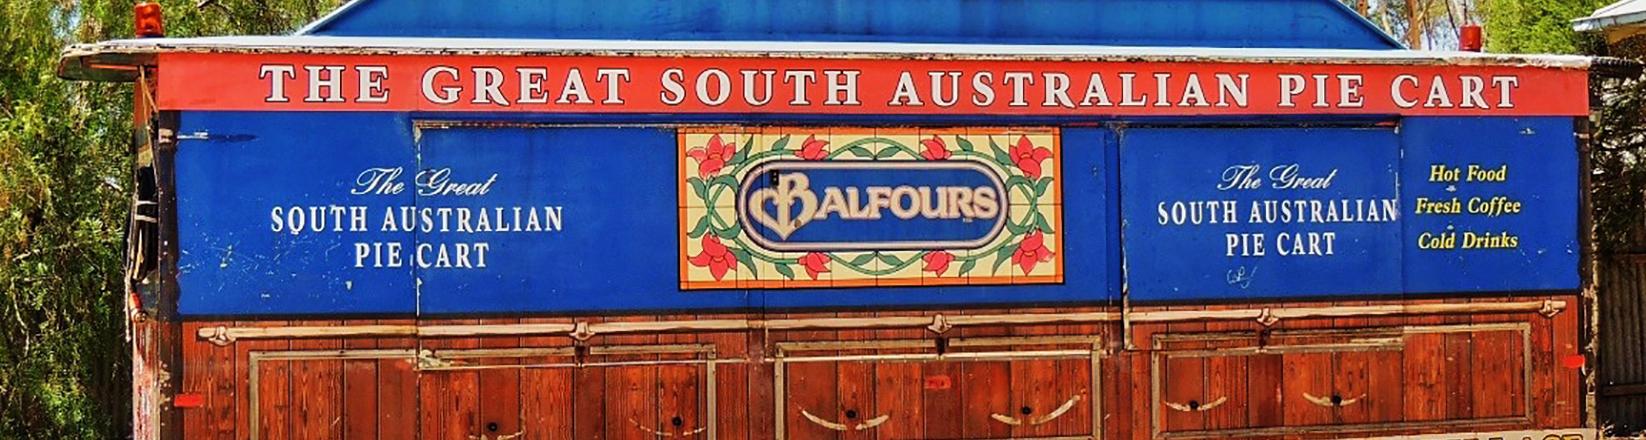 local area marketing LAM south australia